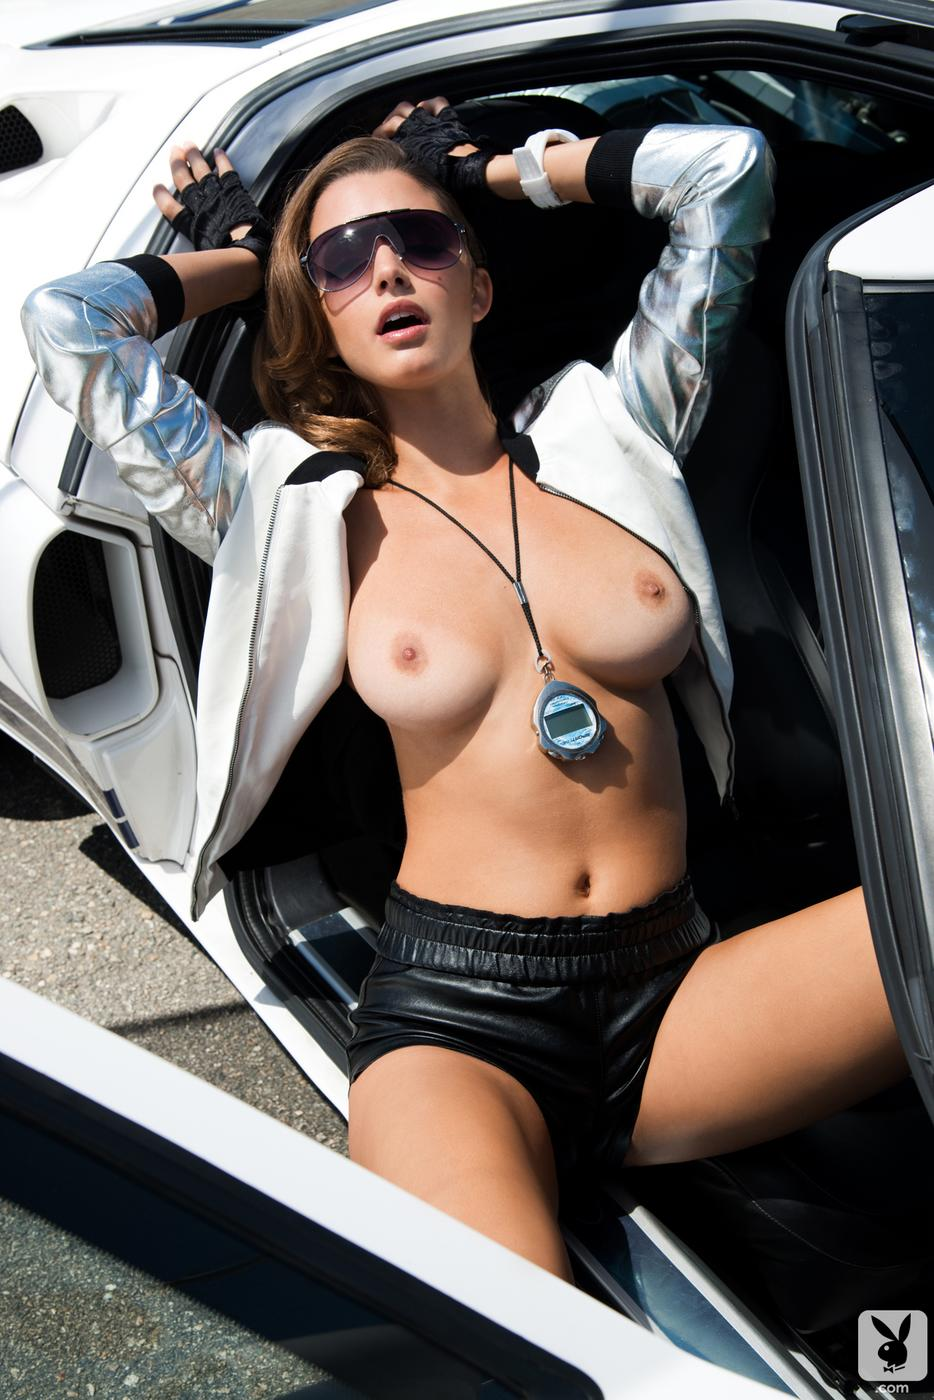 Alyssa Arce Nude Pics alyssa arce nude pictures at erosberry - the best